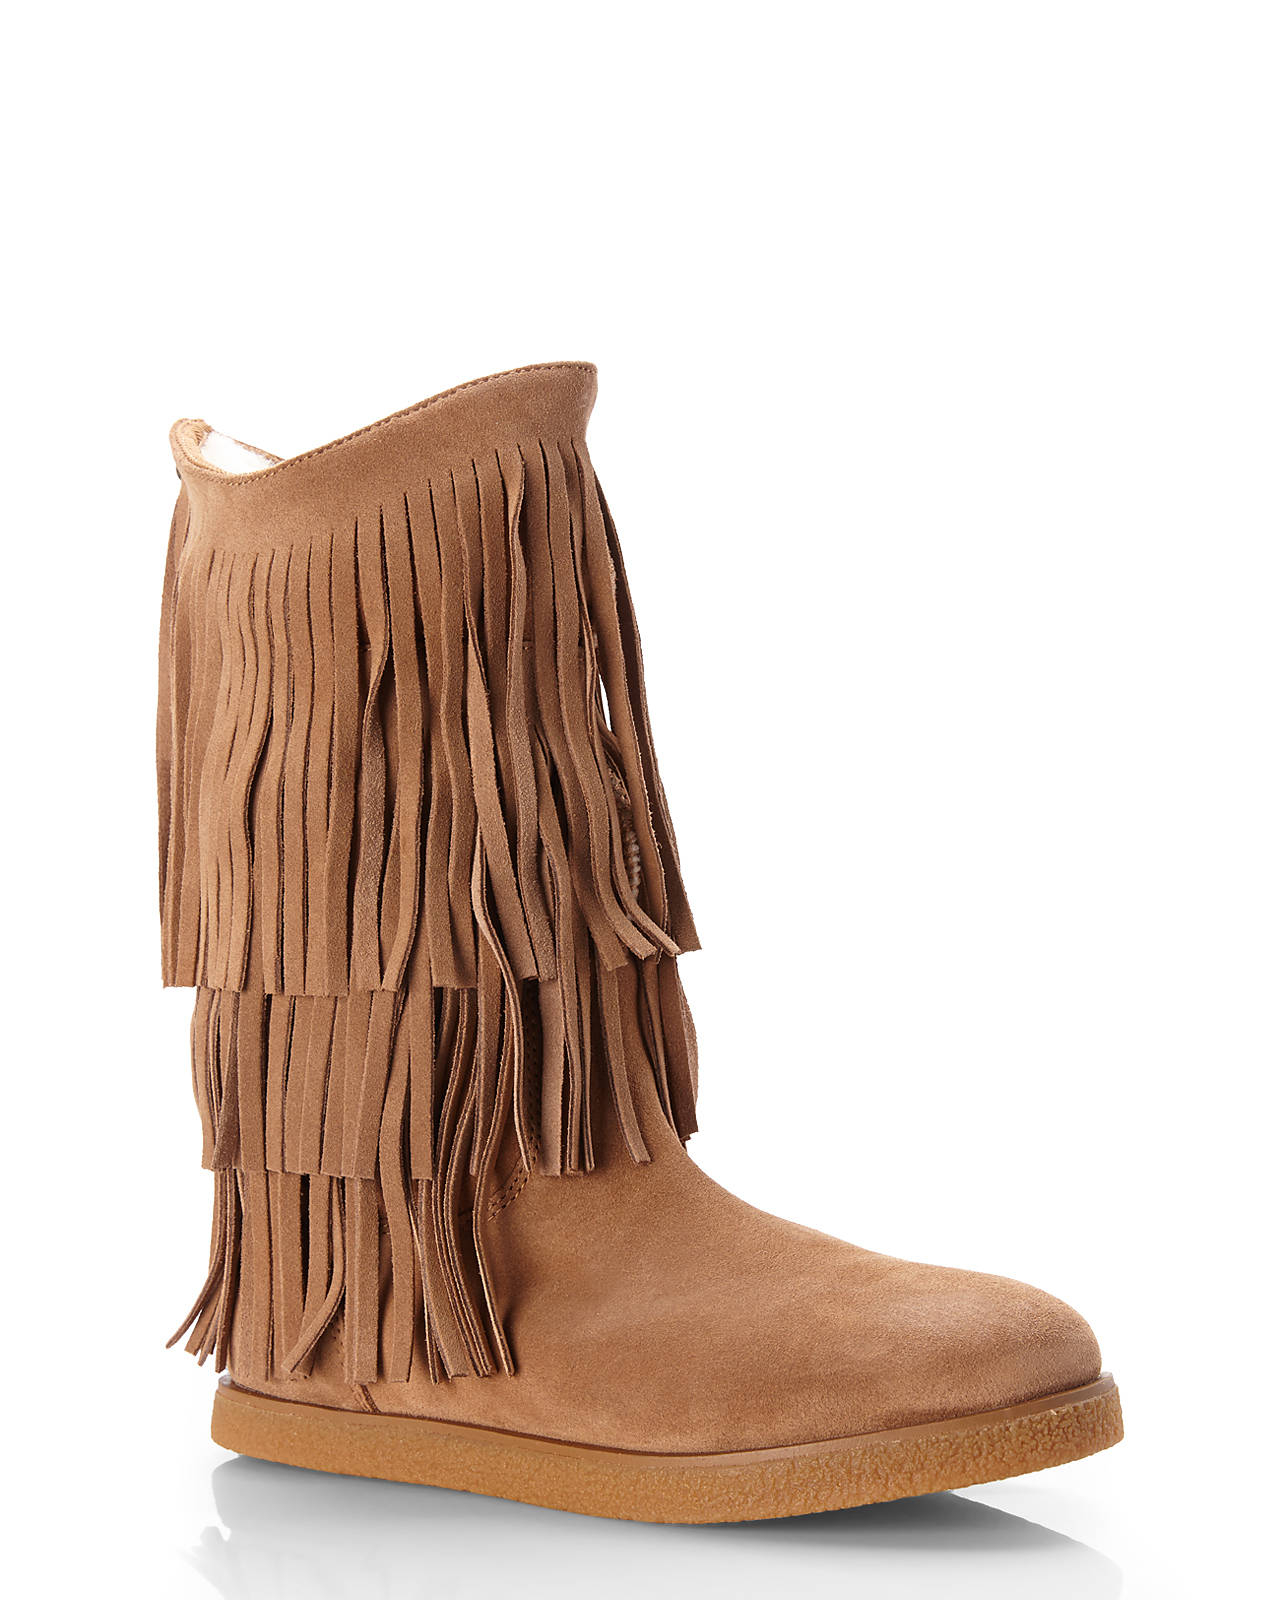 Koolaburra Real Fur Lined Josie Fringe Boots in Brown | Lyst